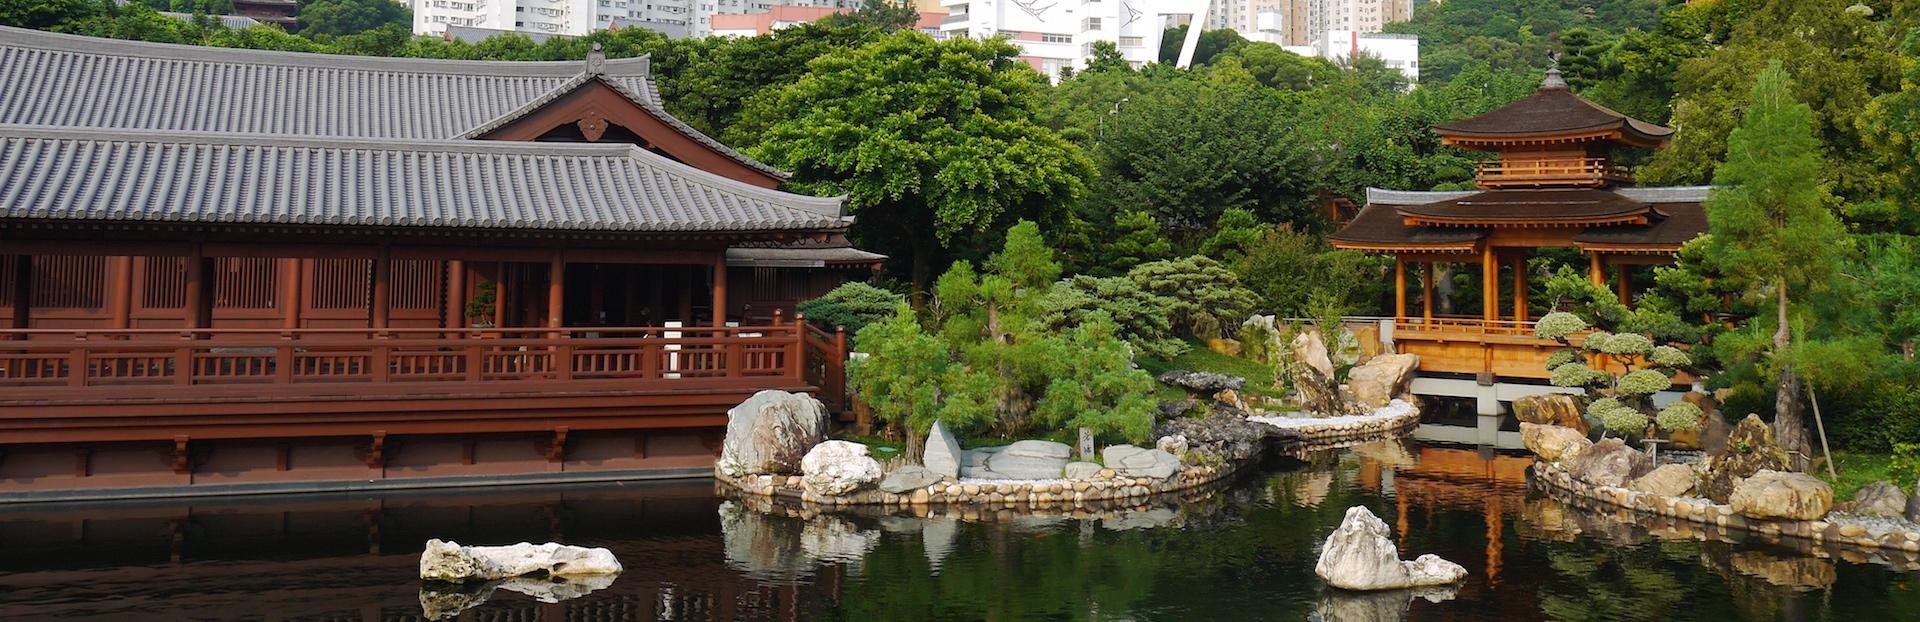 Hong Kong audio tour: Nan Lian Garden: A Journey through the Six Senses